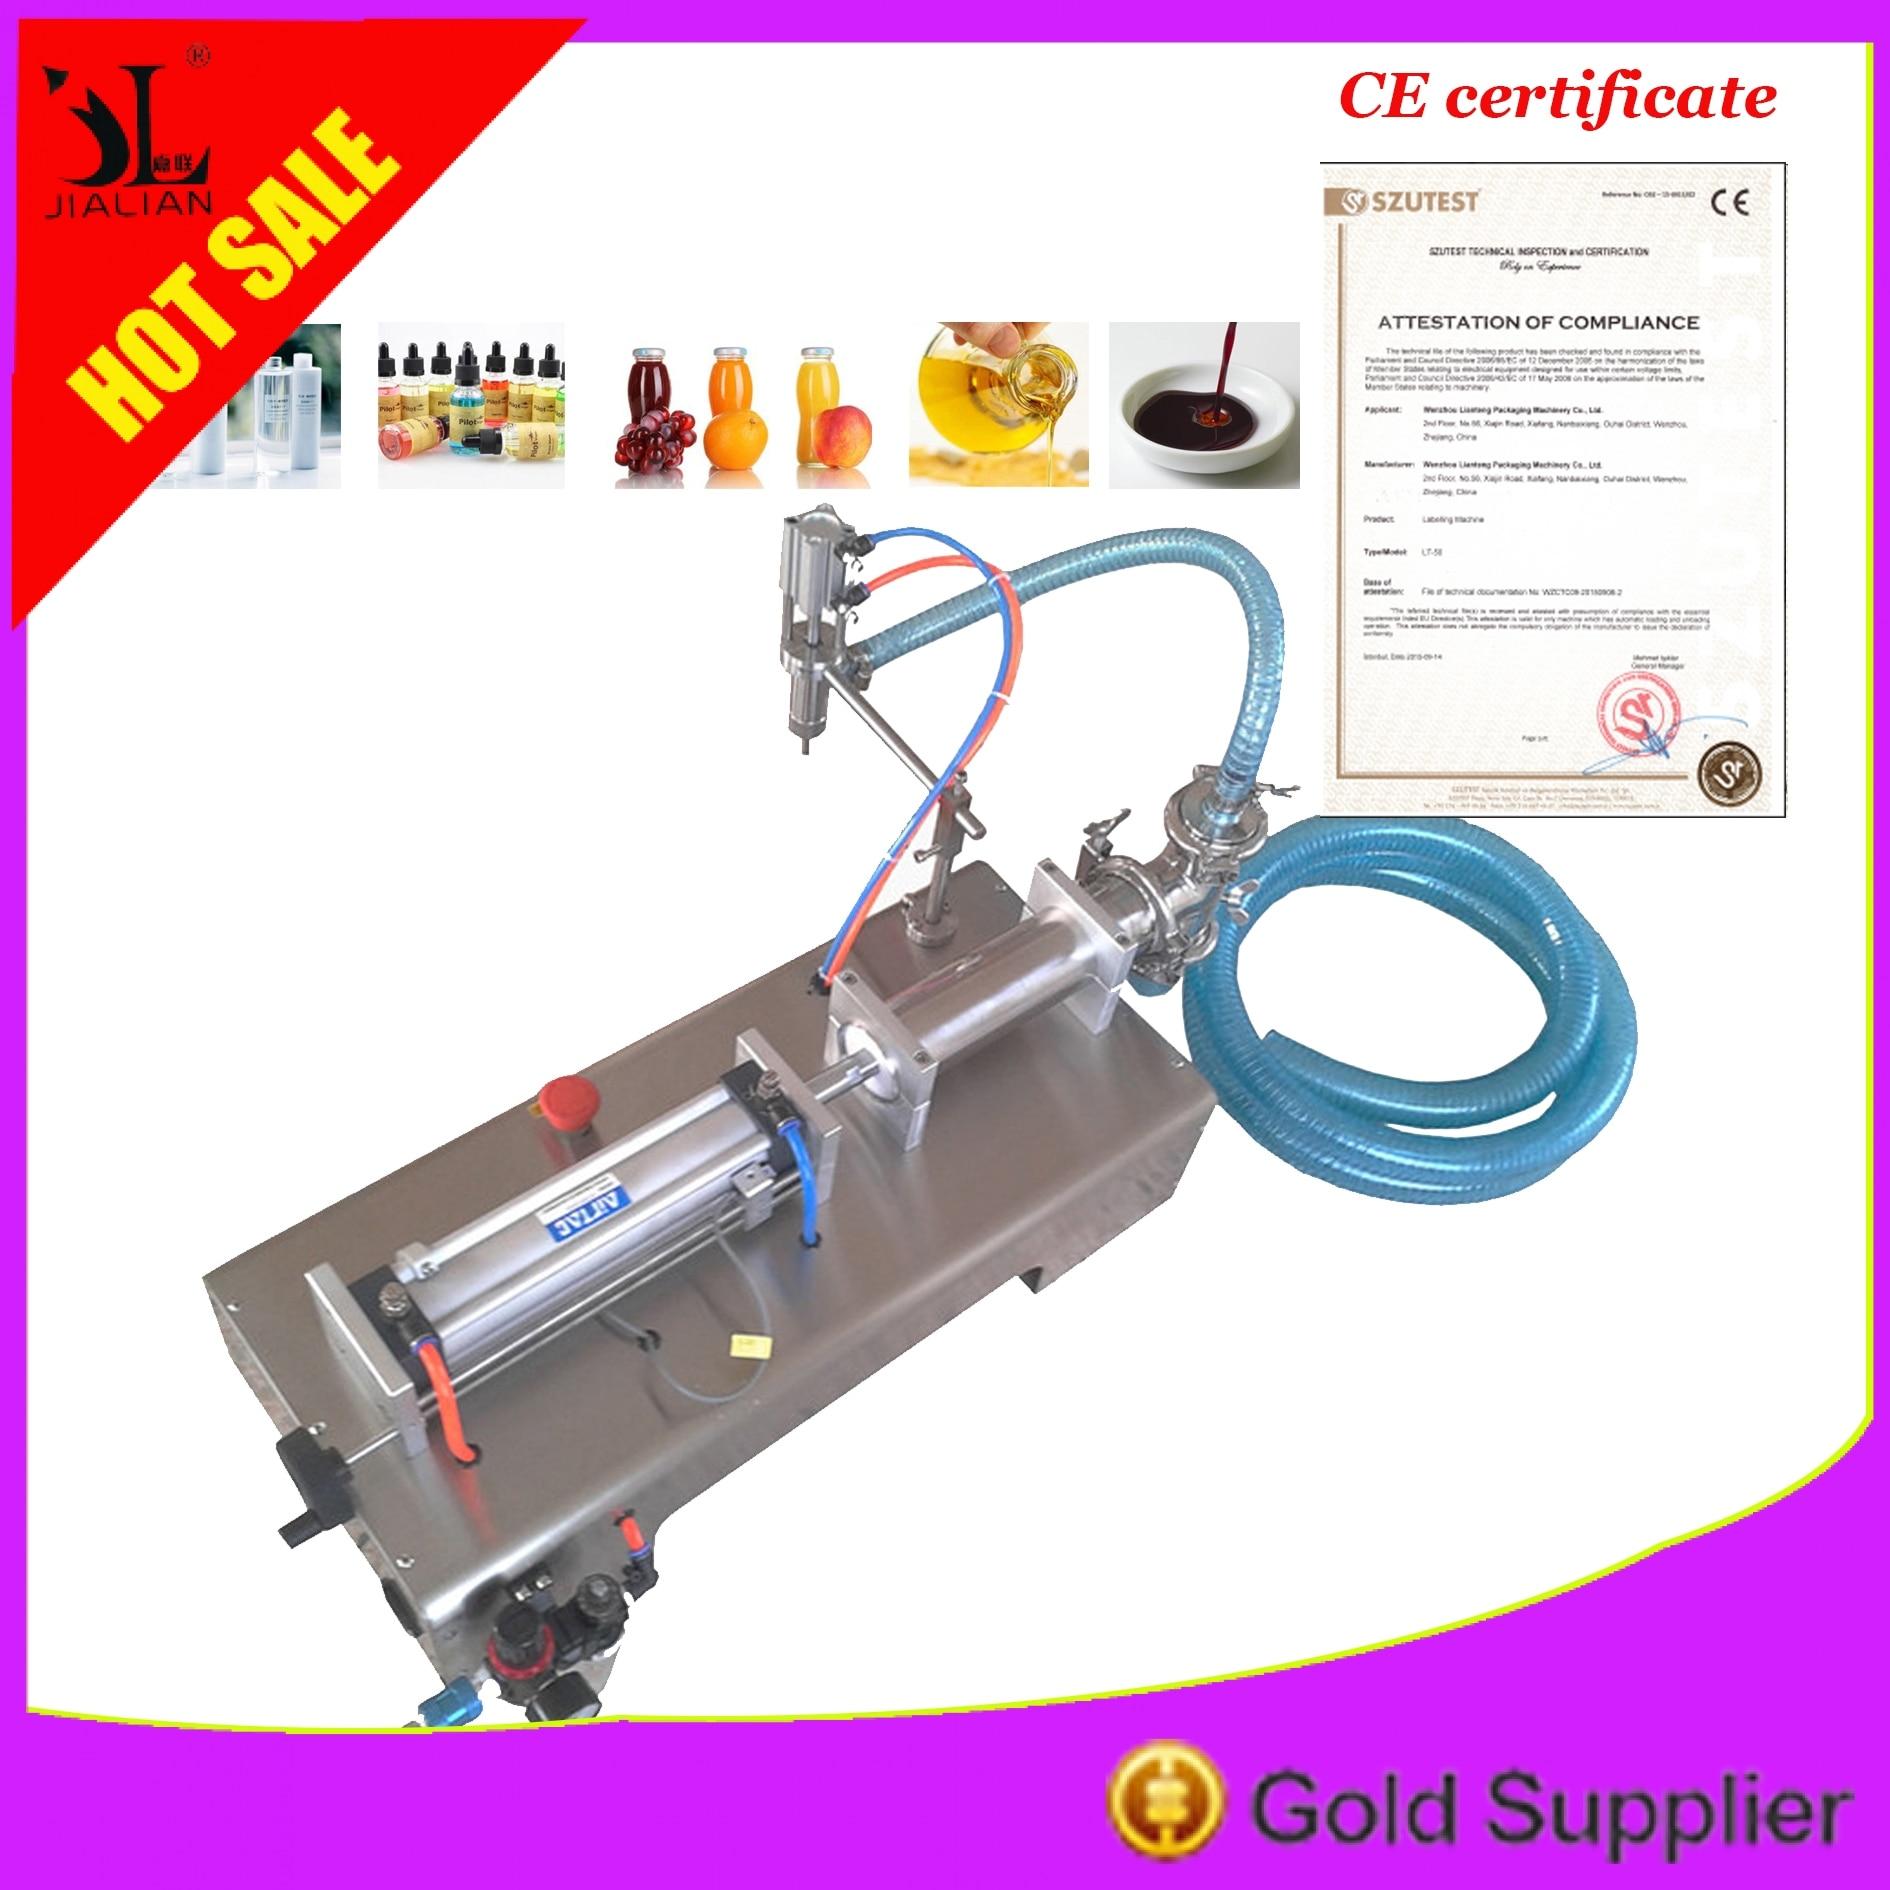 Pneumatic Piston Liquid Filler Shampoo Water Wine Milk Juice Vinegar Coffee Oil Drink Detergent Filling Machine Free Shipping